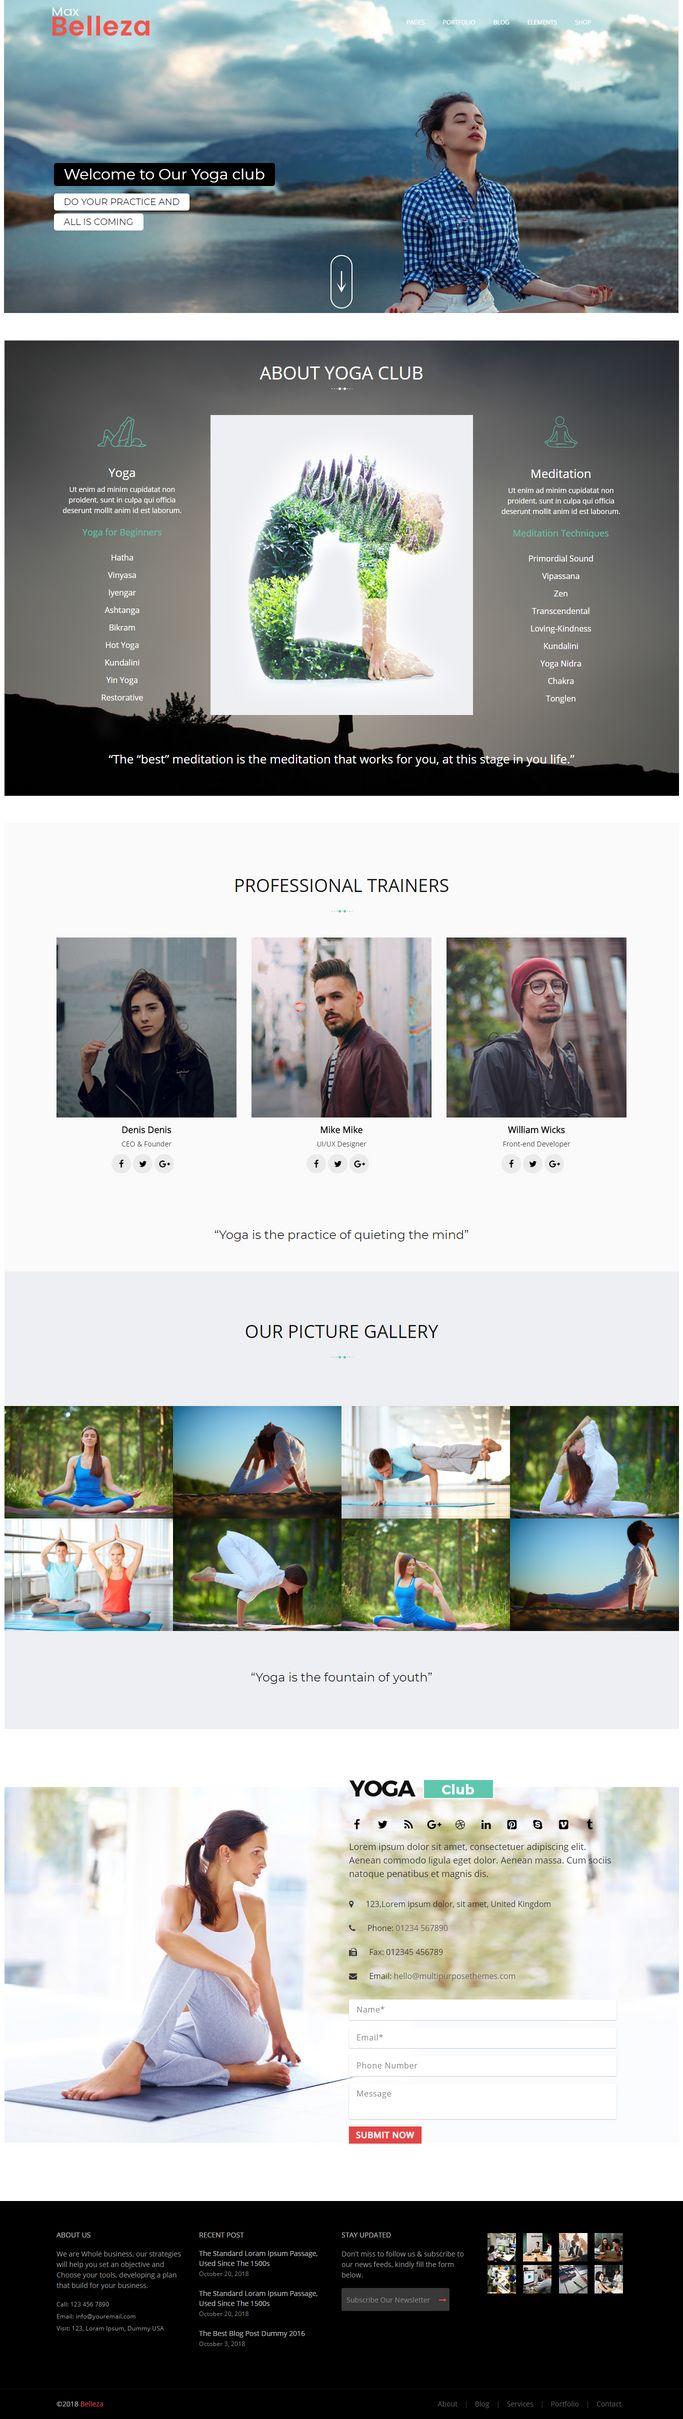 screencapture-wpthemes-multipurposethemes-belleza-yoga-2018-10-26-16_08_08[1]